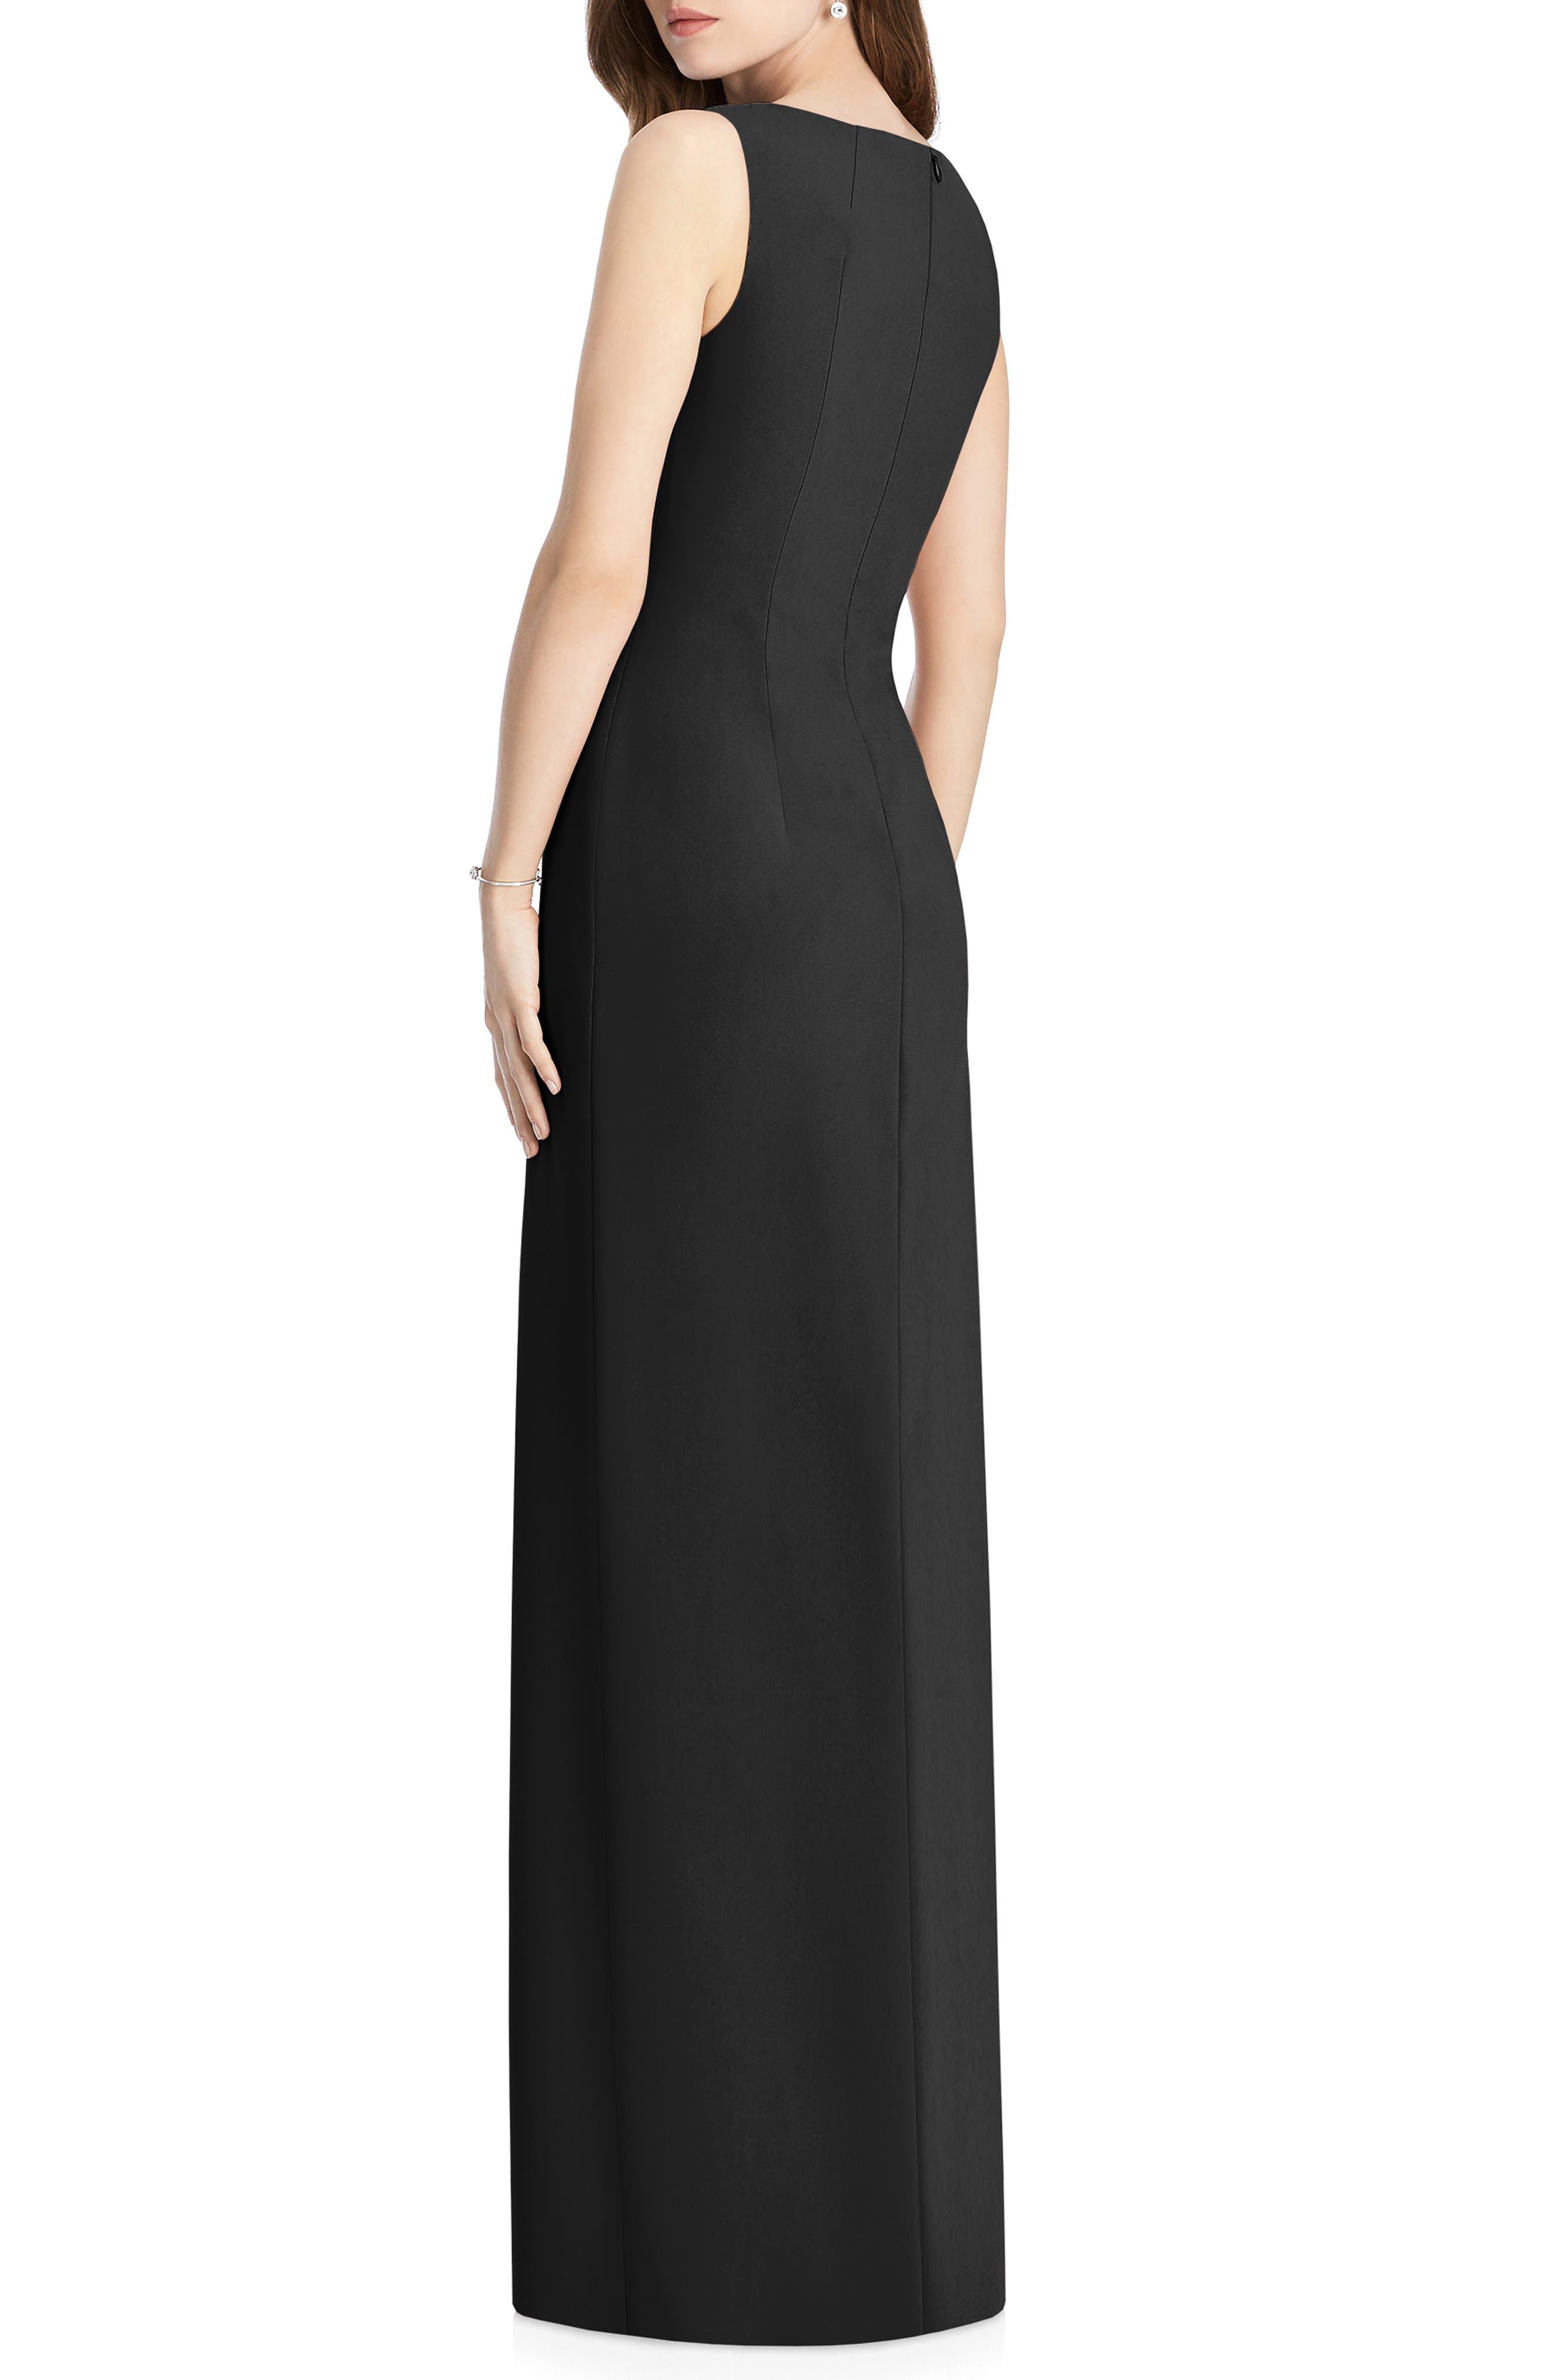 JENNY PACKHAM, Crepe Column Gown, Alternate thumbnail 2, color, BLACK